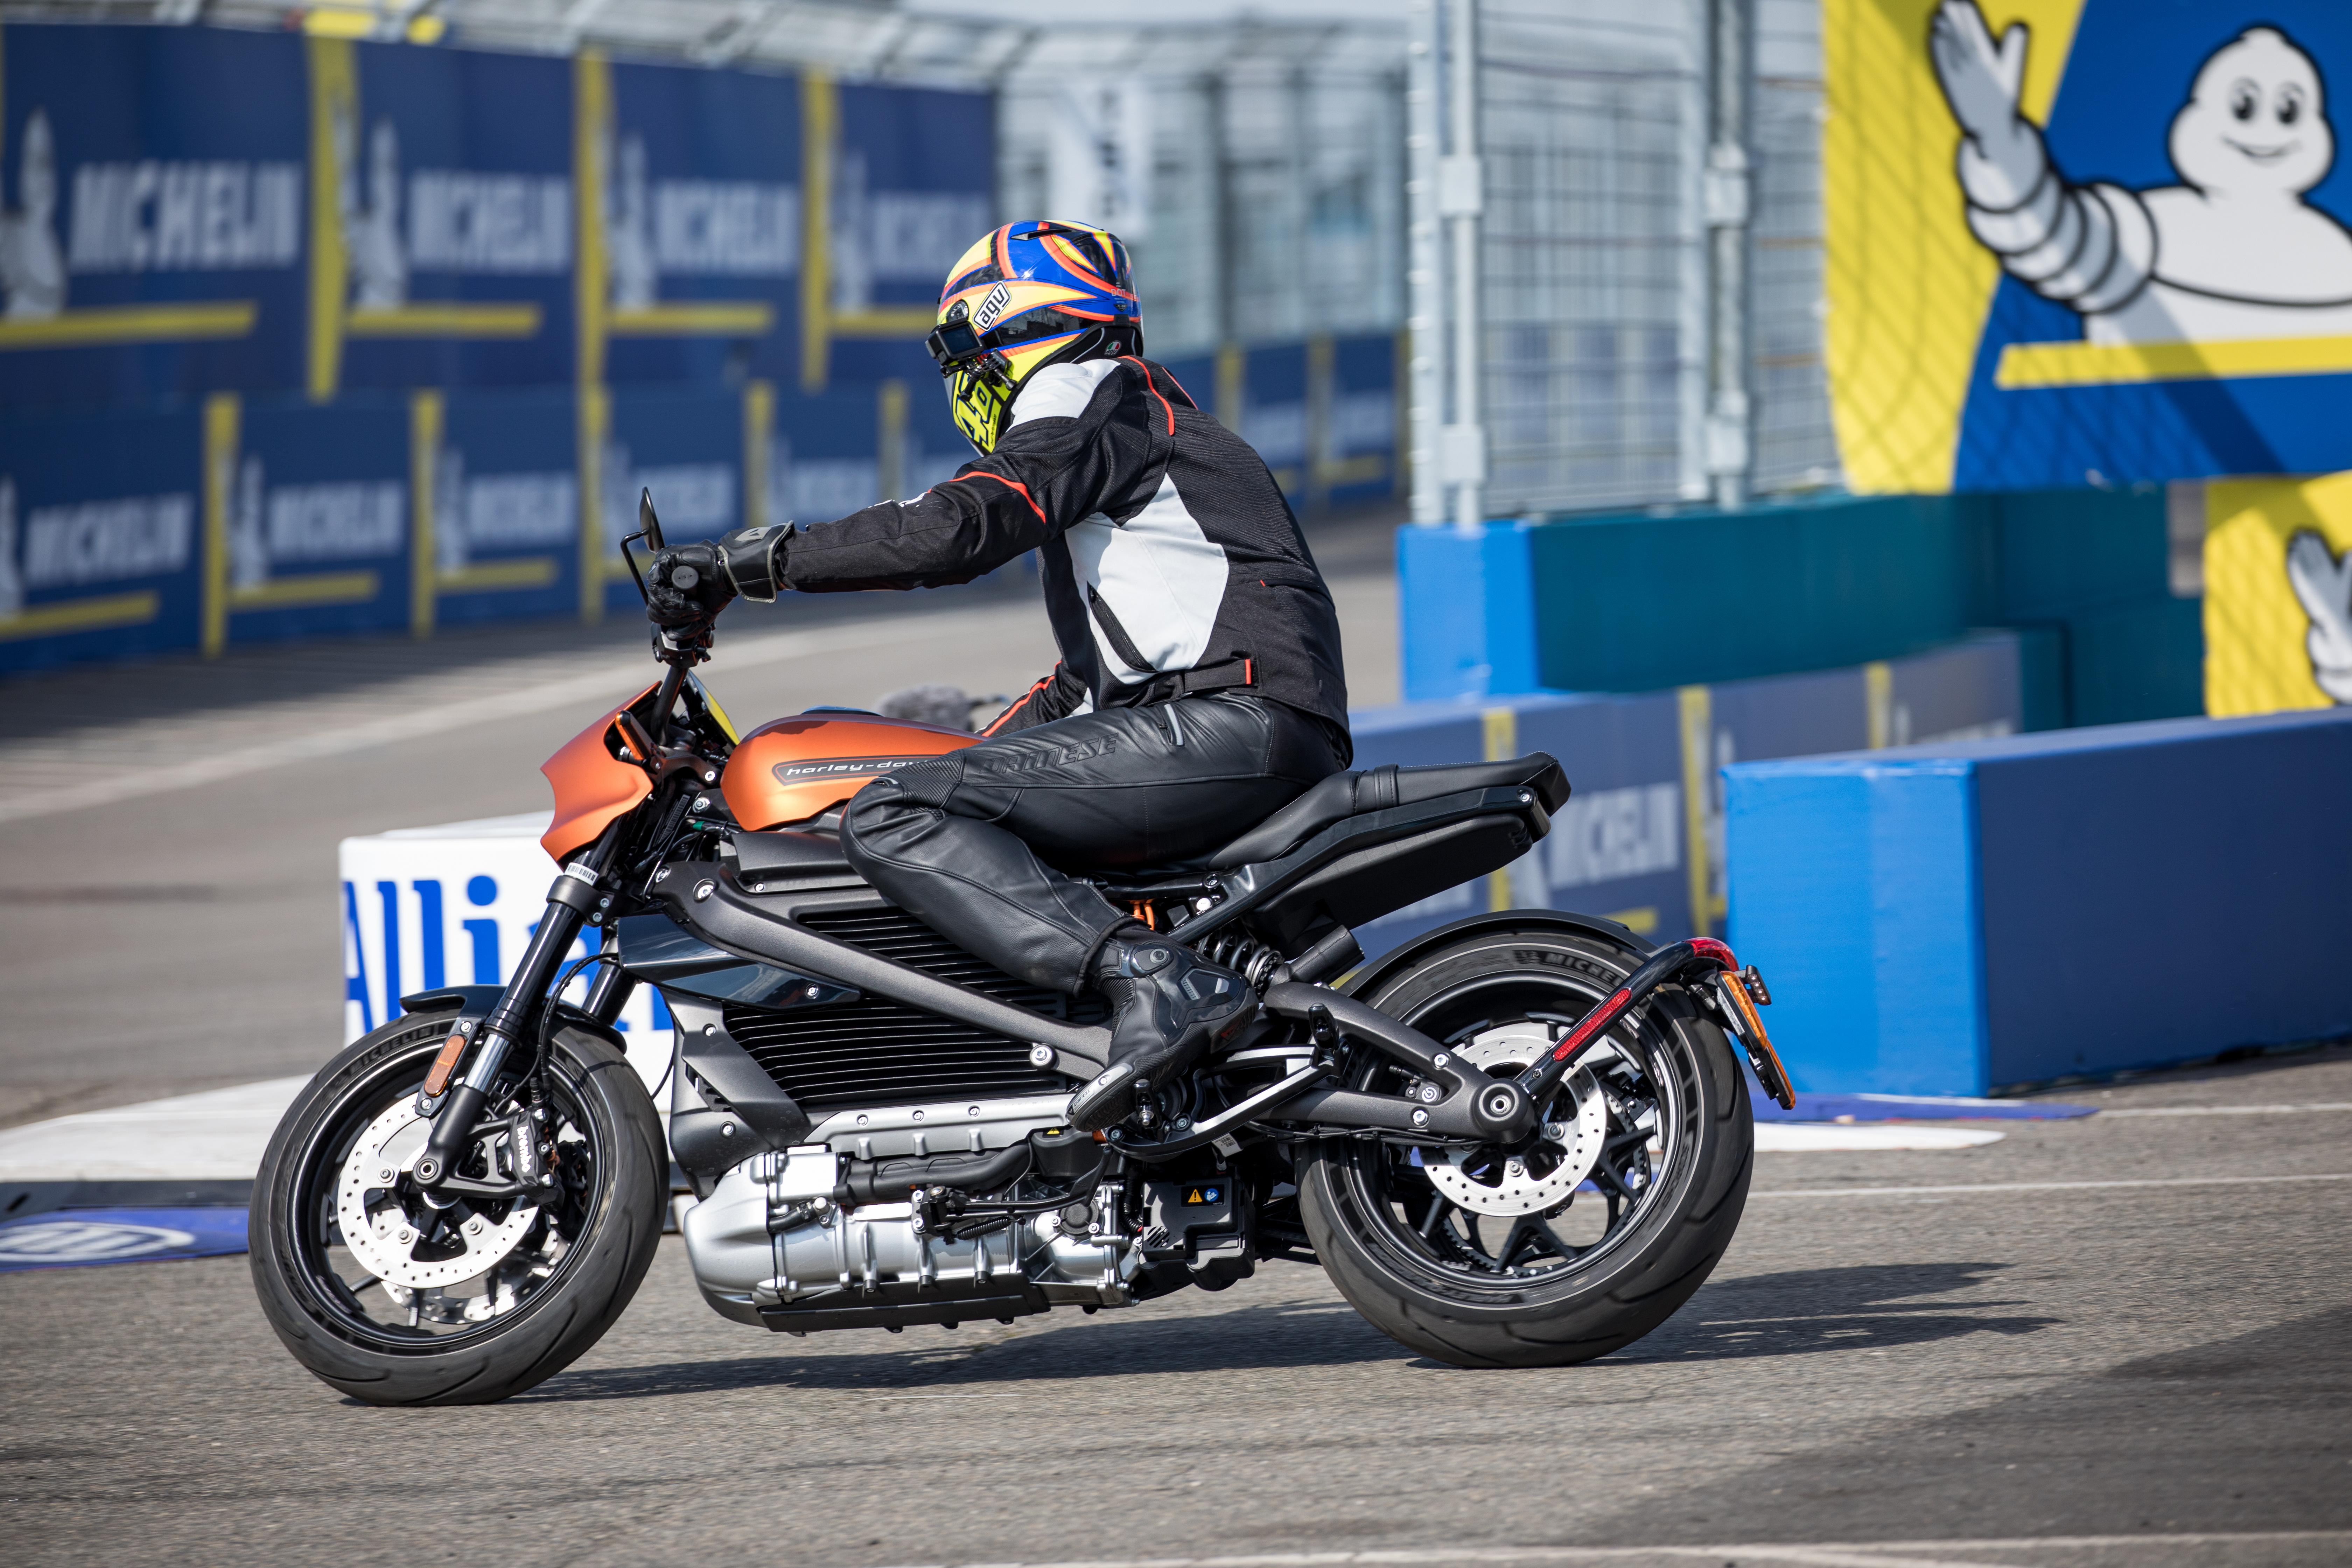 Harley Davidson LiveWire Track